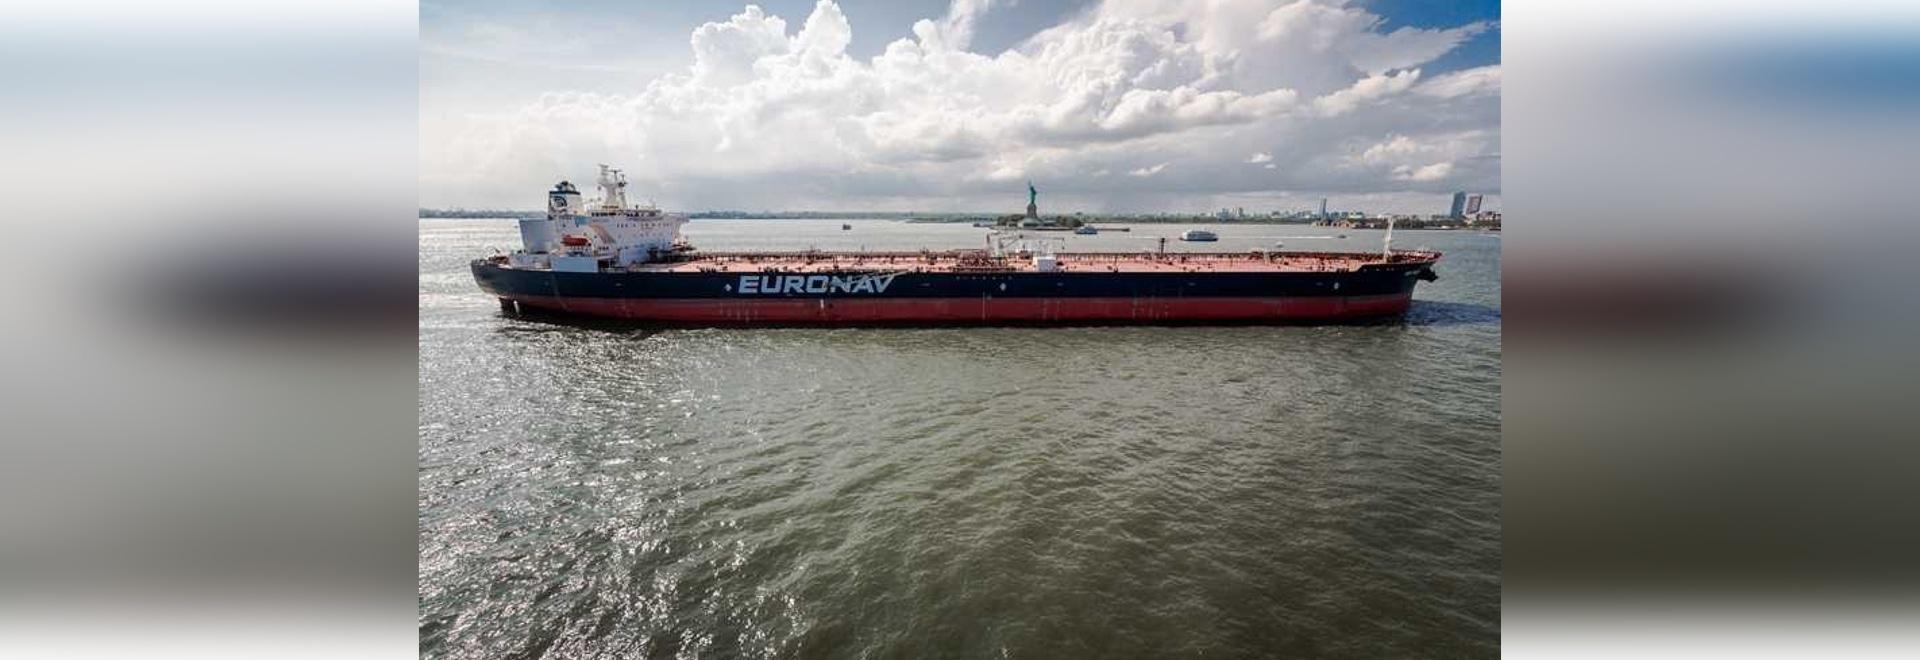 Euronav Chooses Ecochlor BWTS for Seven Tankers